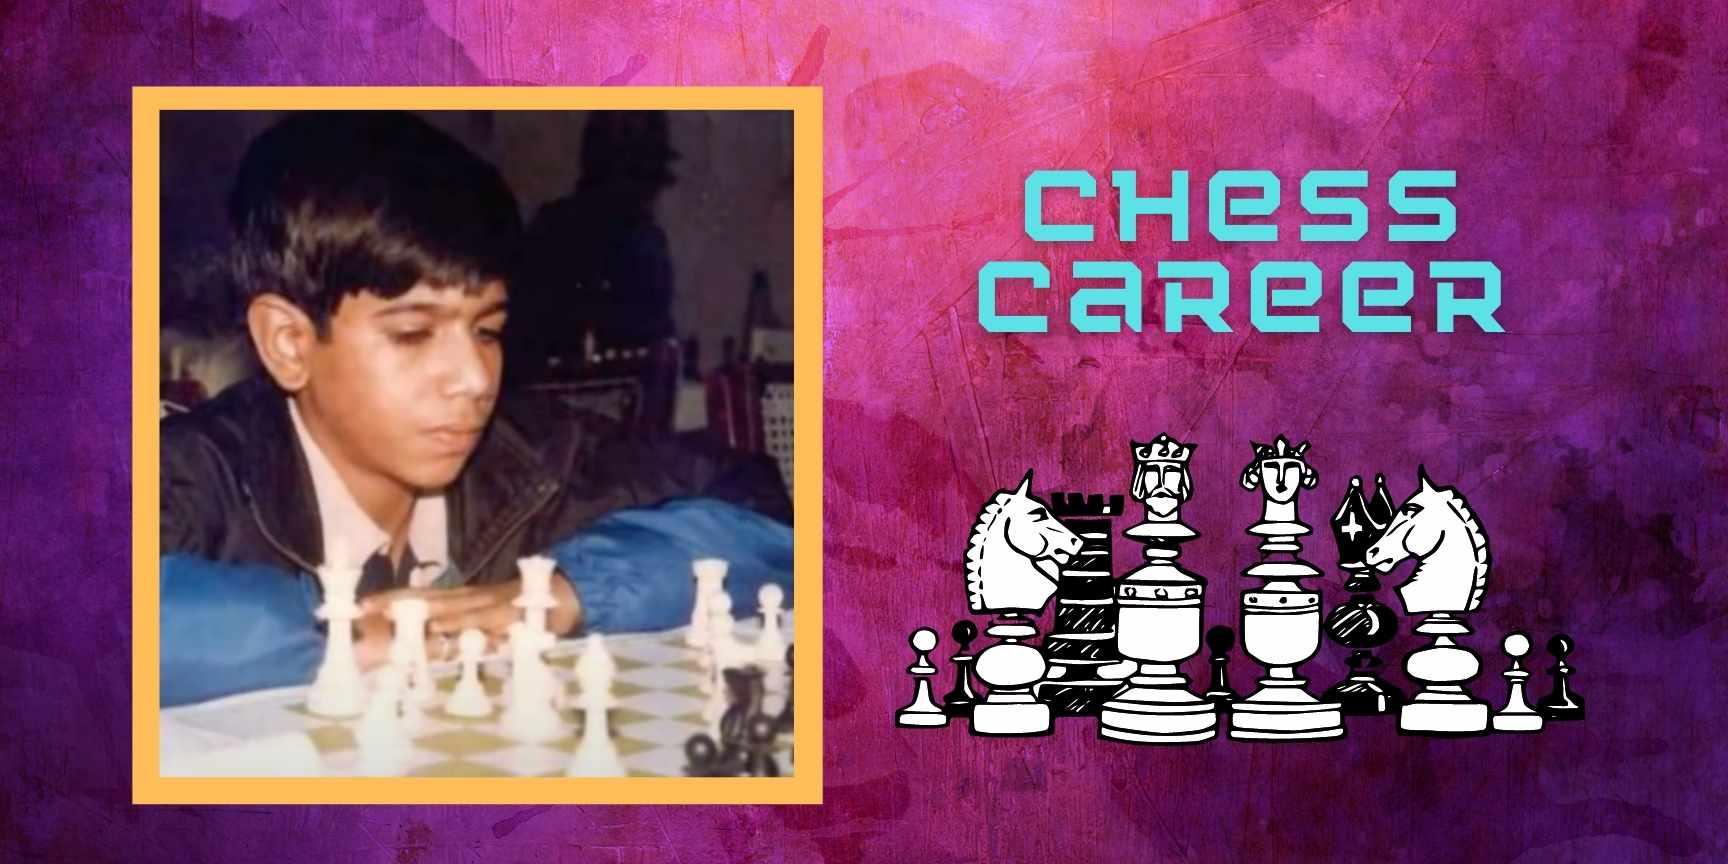 chess career